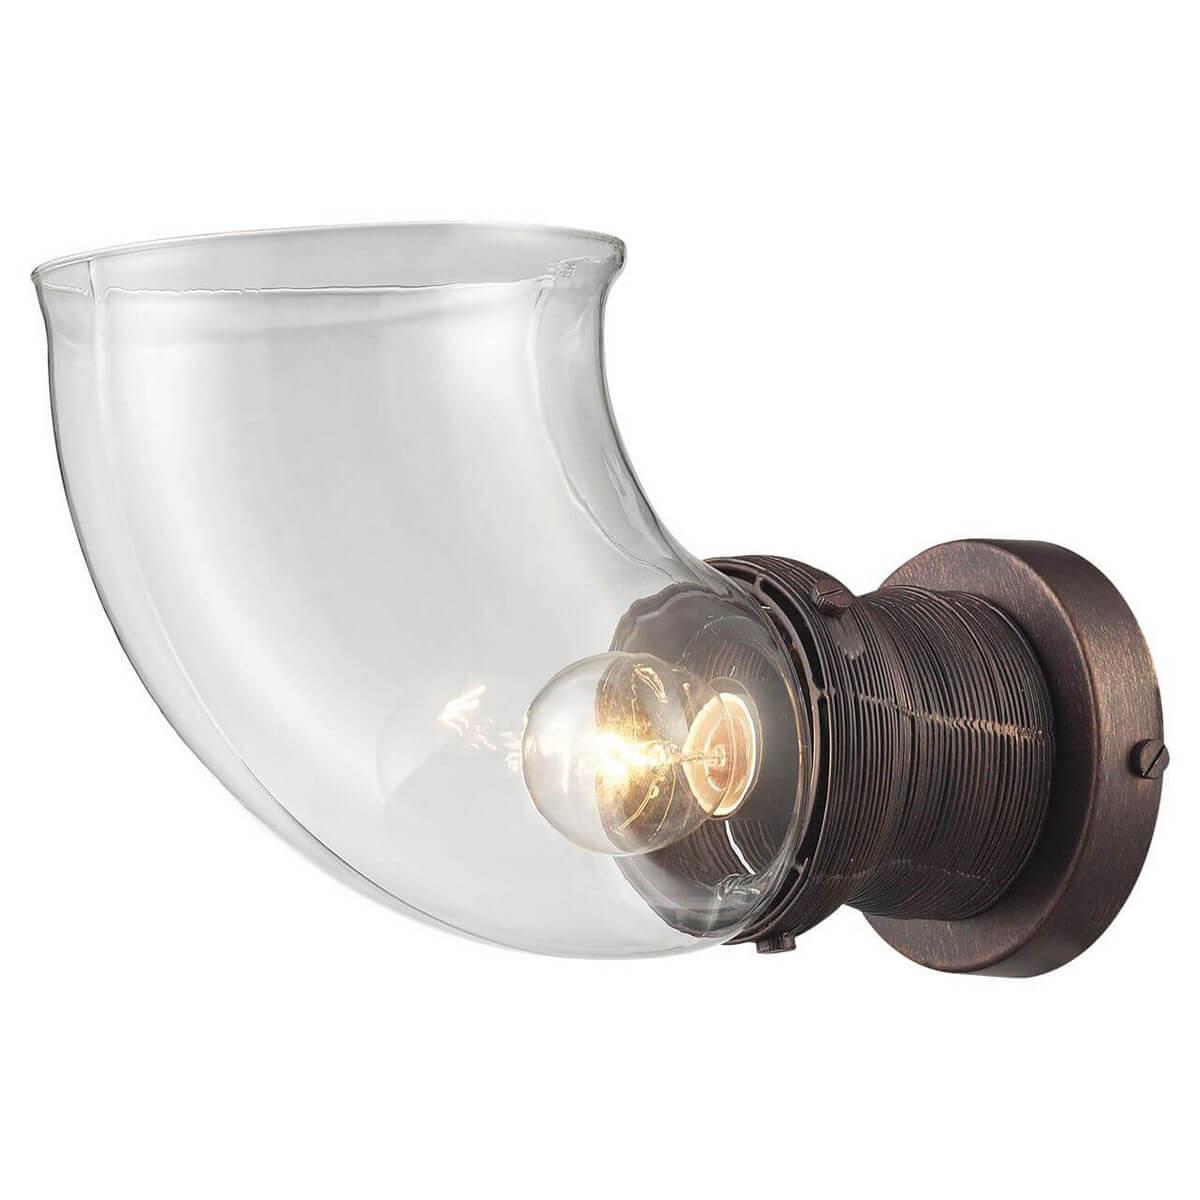 лучшая цена Бра Lussole Loft I LSP-9127